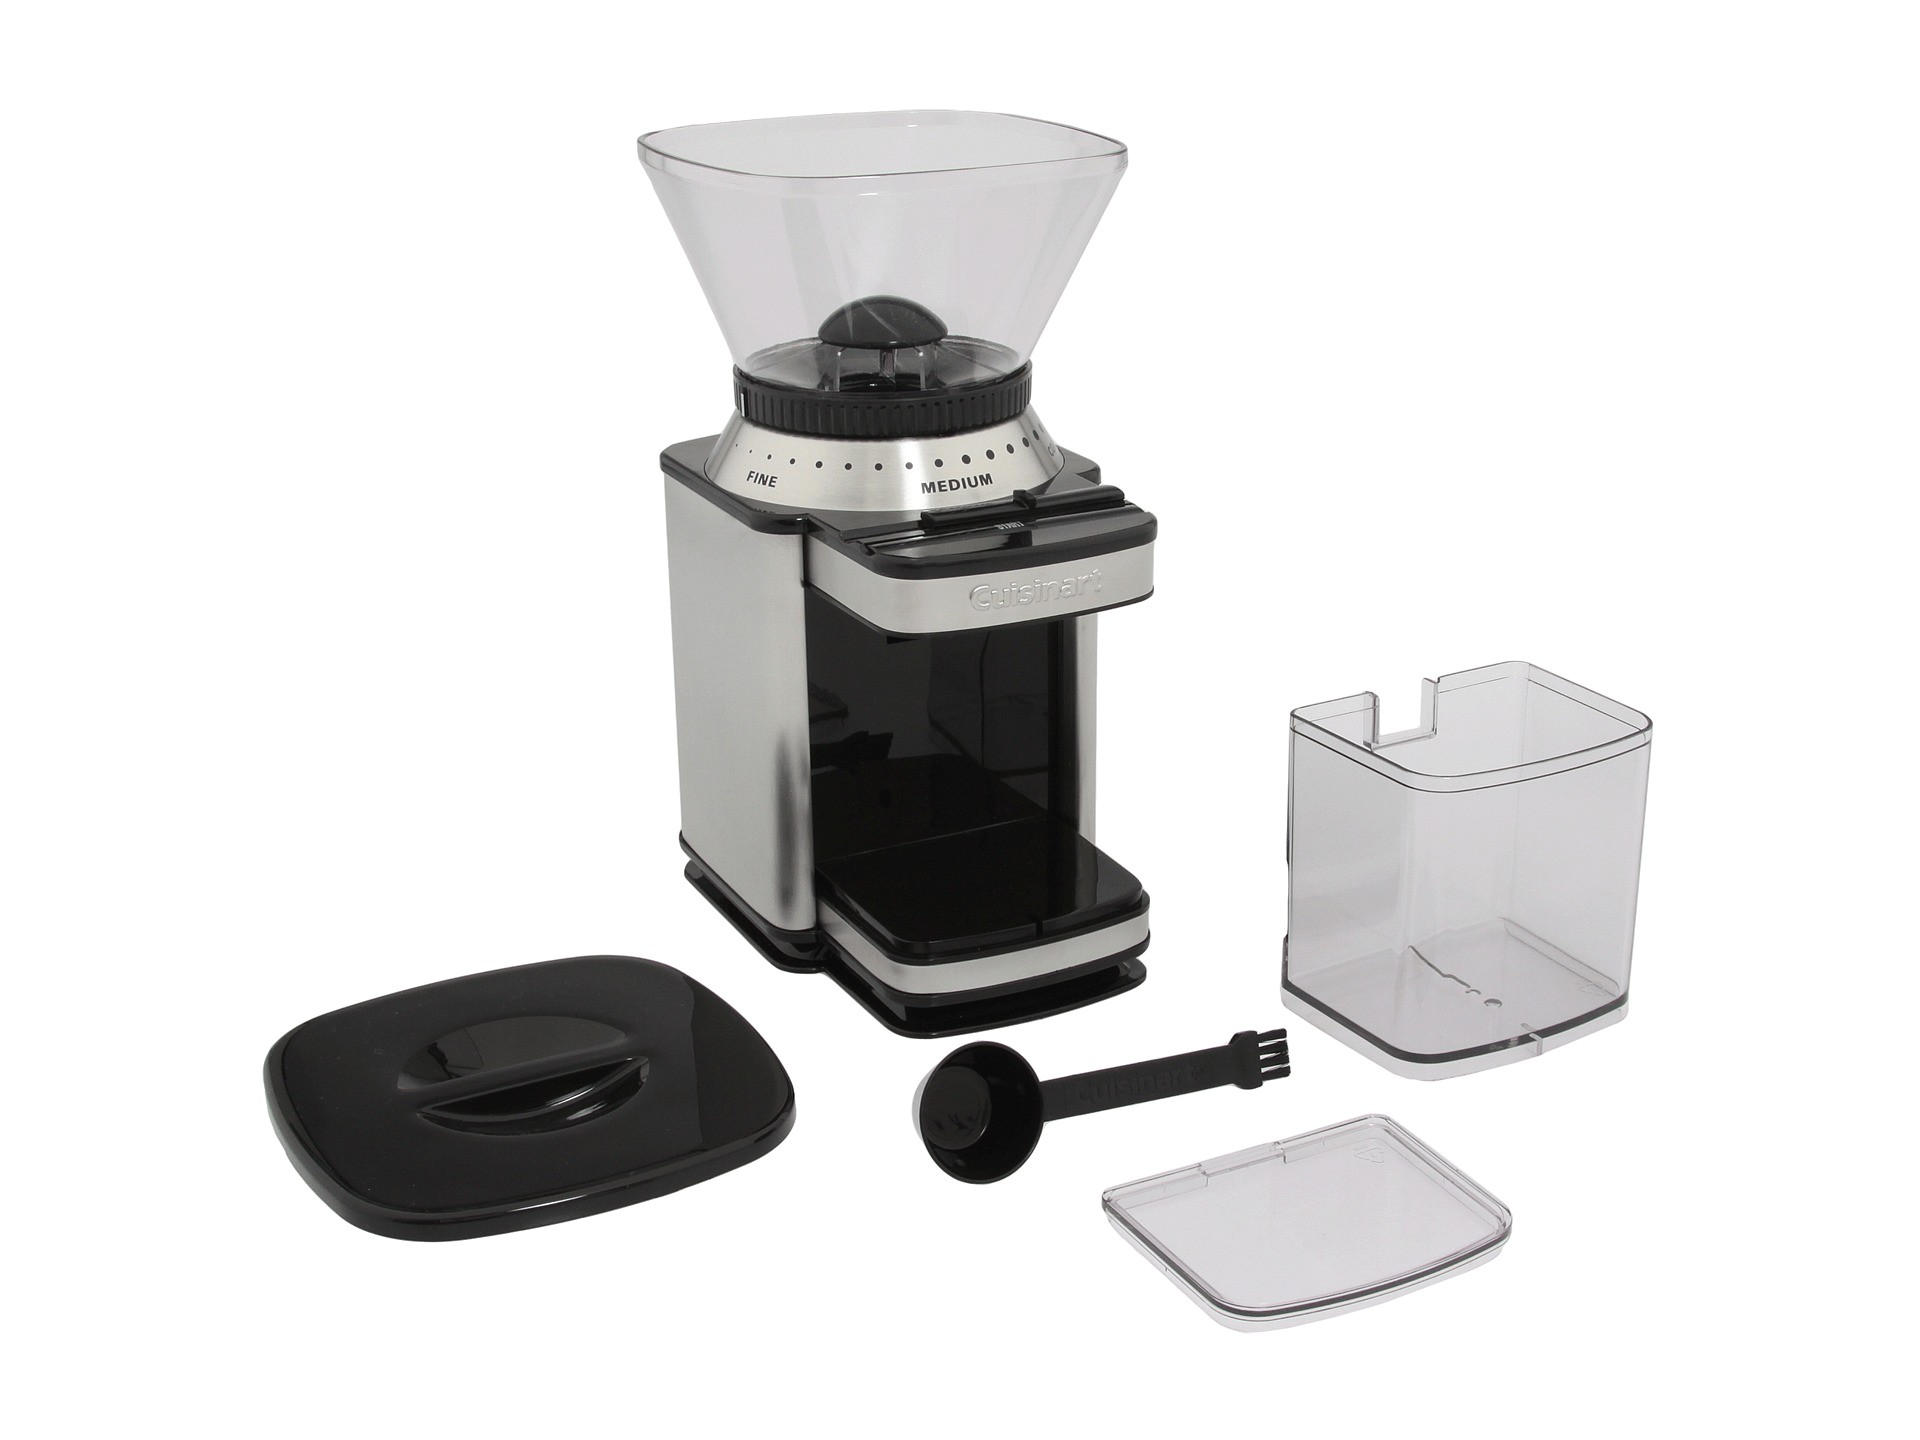 cuisinart dbm 8 supreme grind automatic burr mill